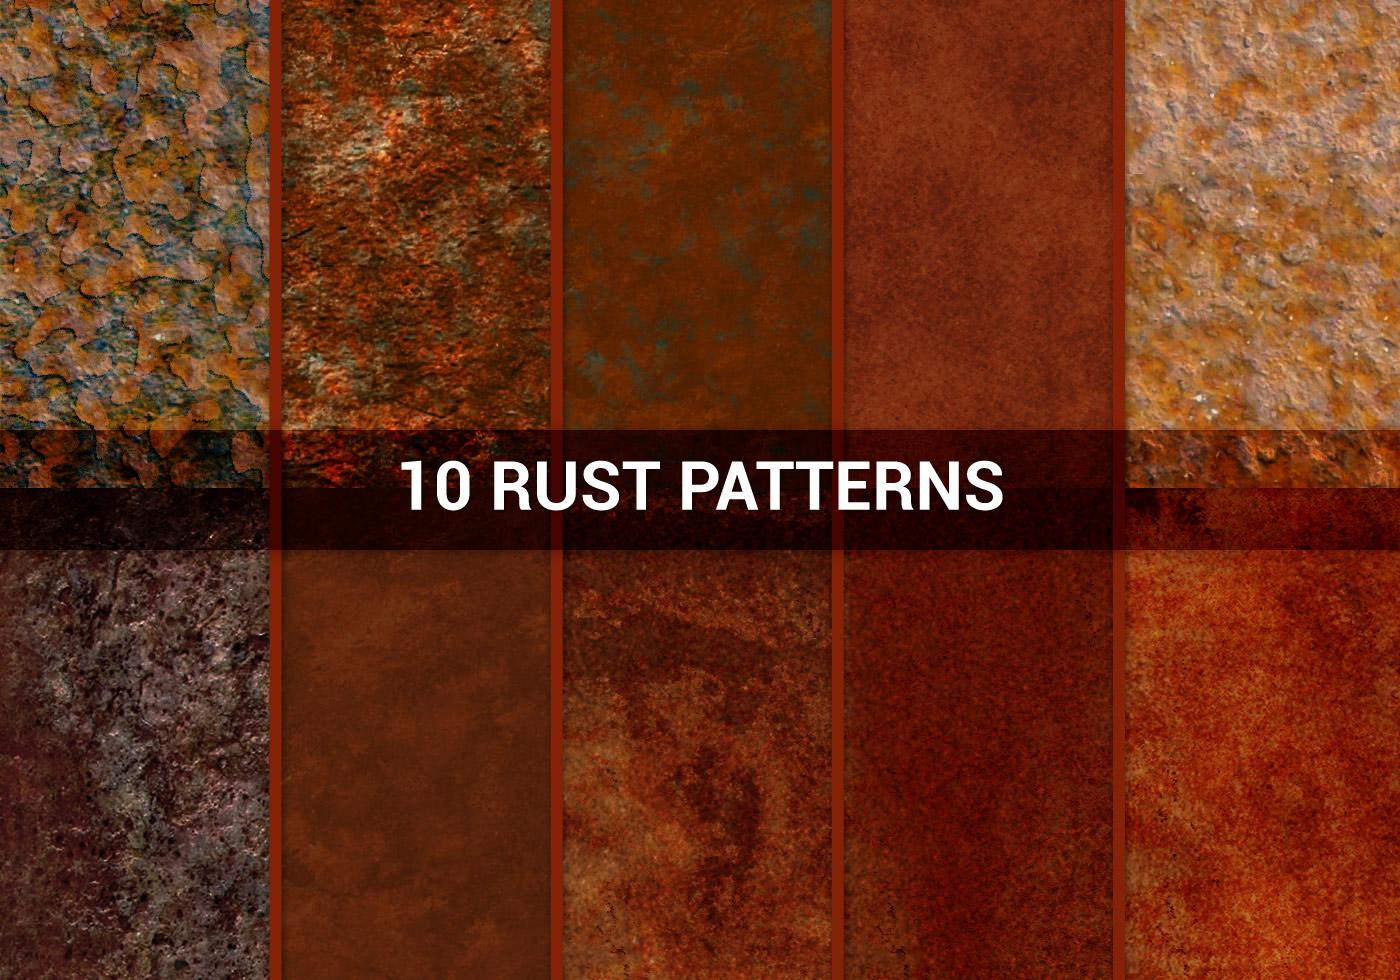 10 rust patterns free photoshop patterns at brusheezy